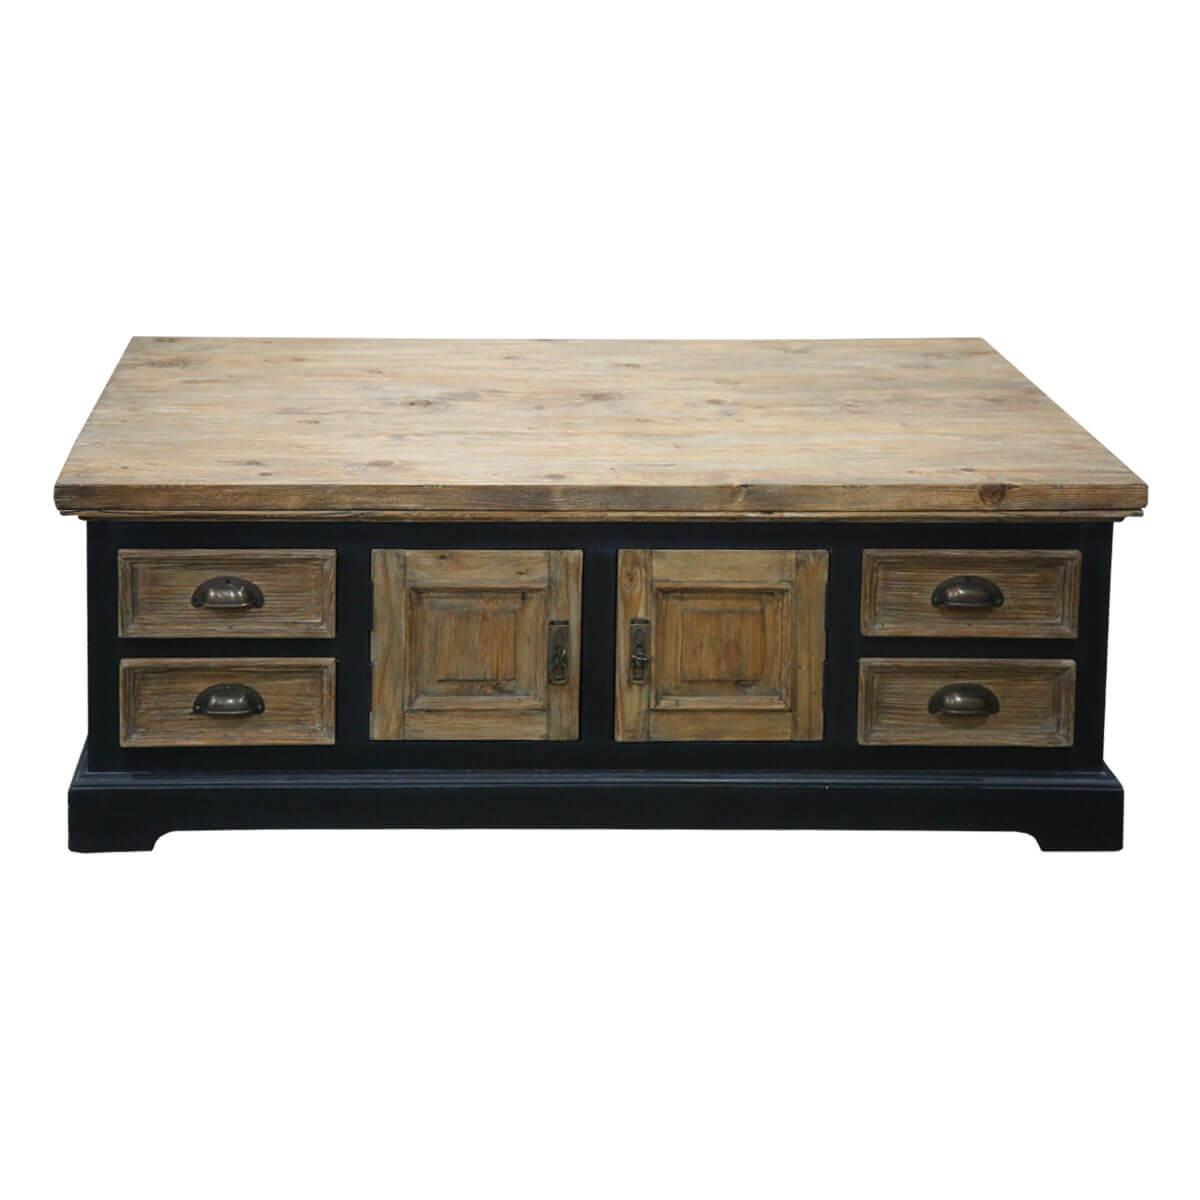 Wylie Teak and Mahogany Wood 8 Drawer Rectangular Storage ...